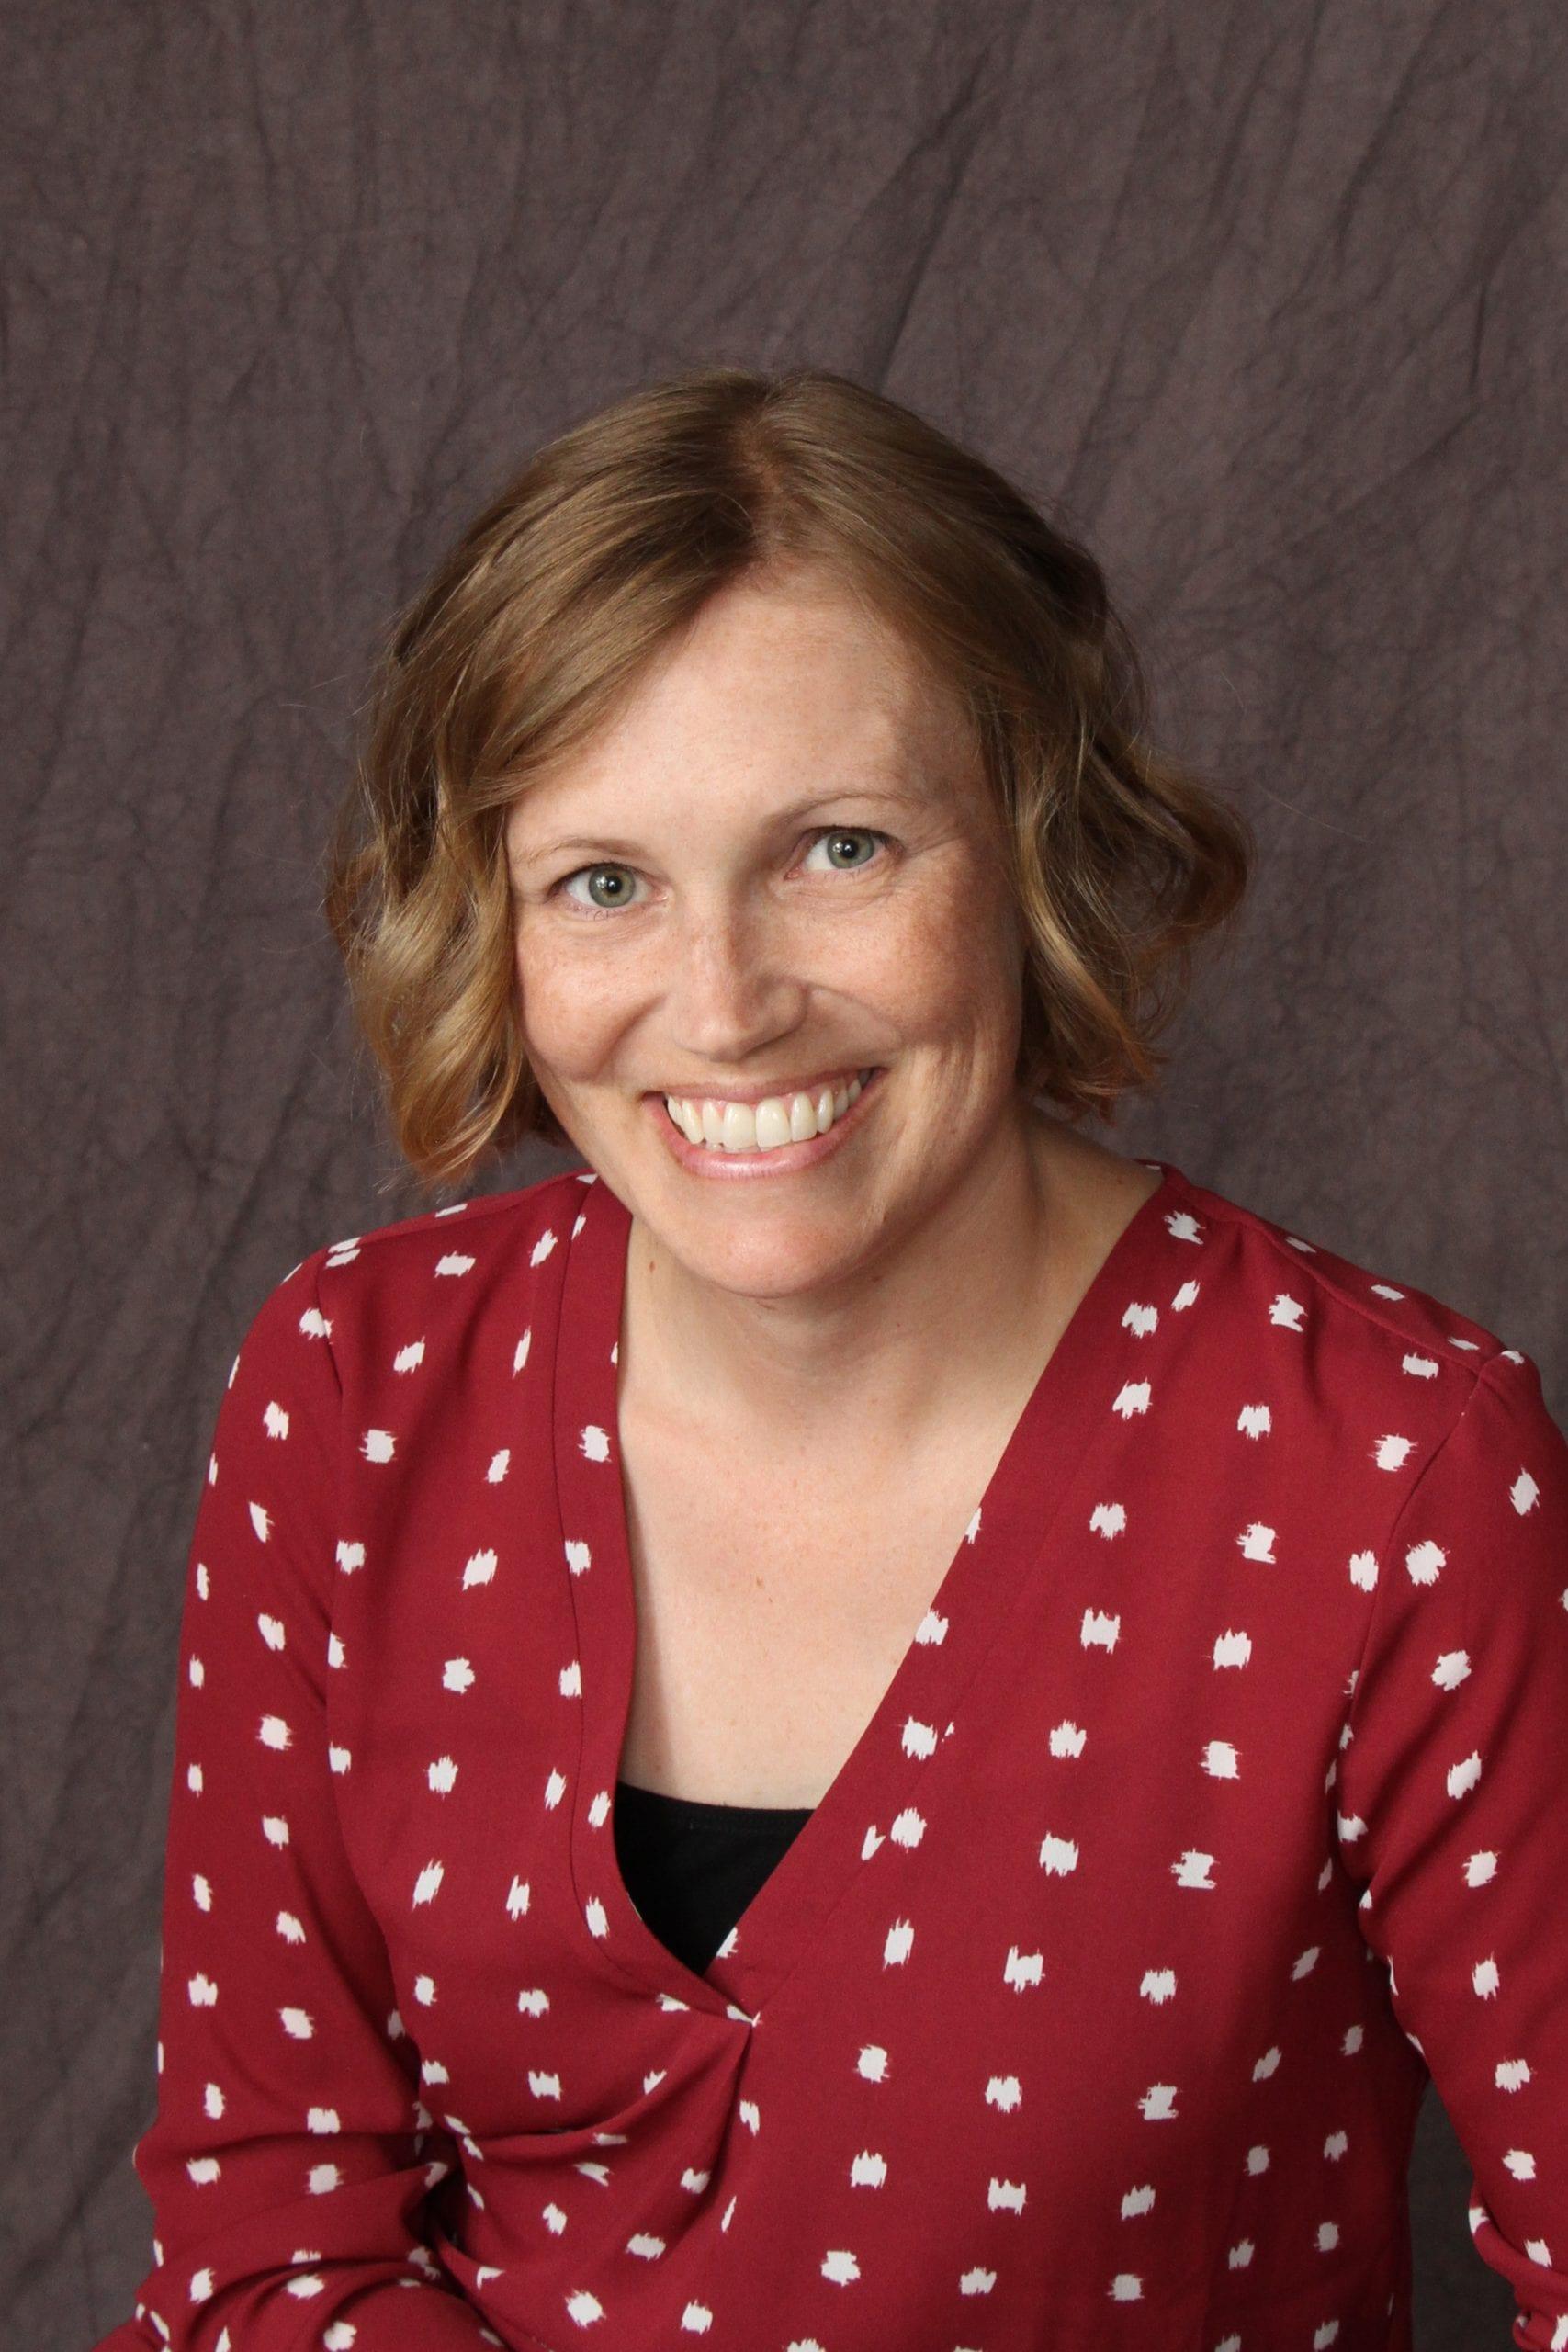 Alyssa Petrik